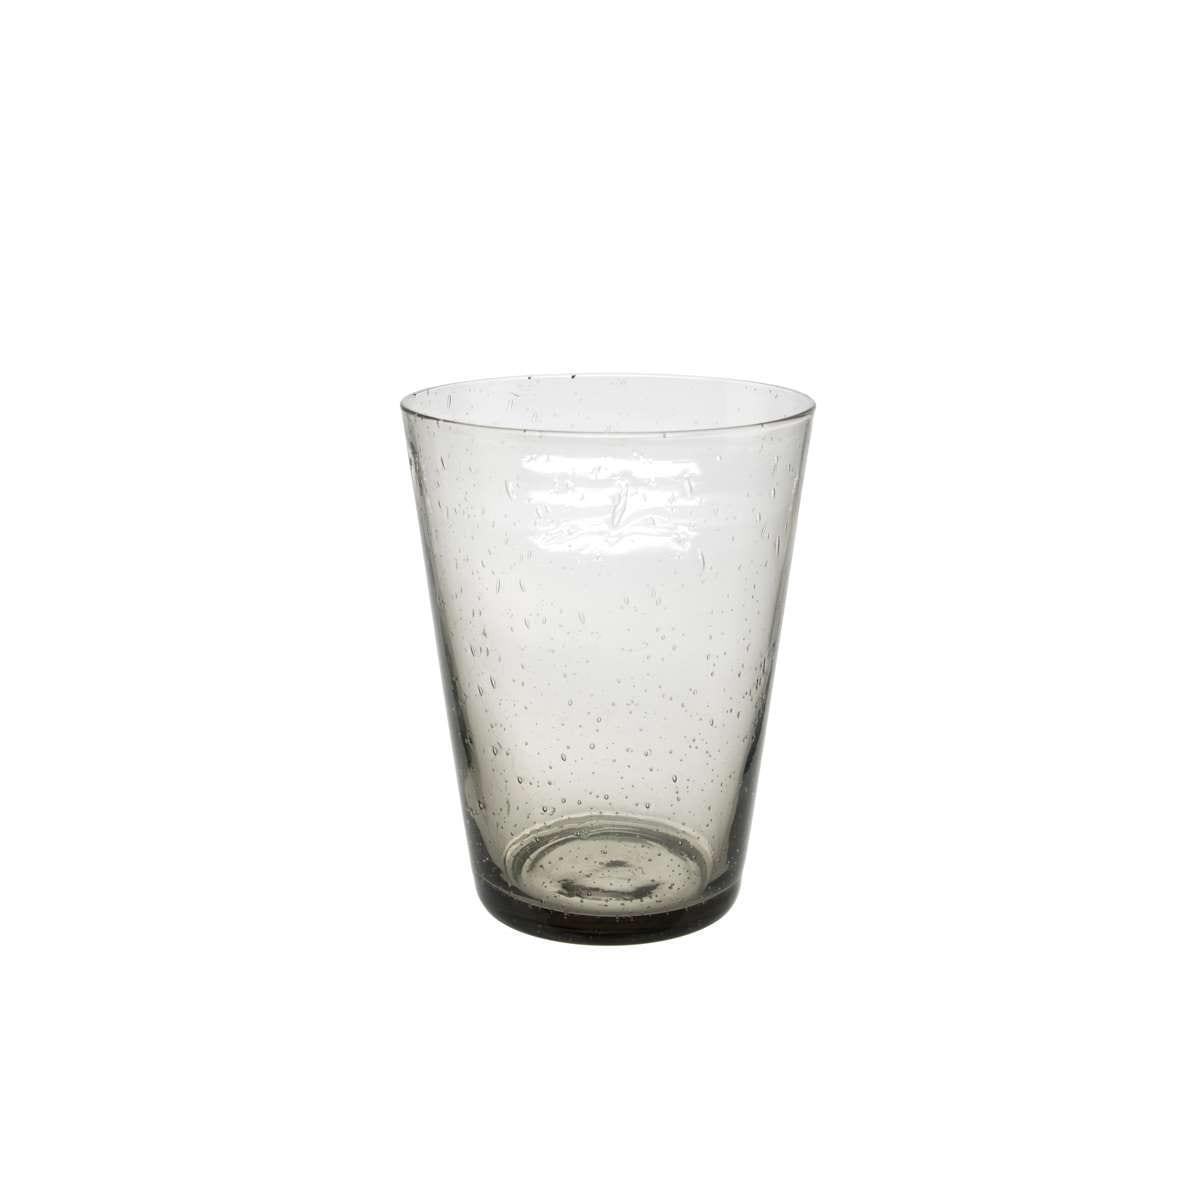 S/6 Ποτήρι ουίσκυ φυσητό Sunset γυάλινο γκρι φιμέ 330ml